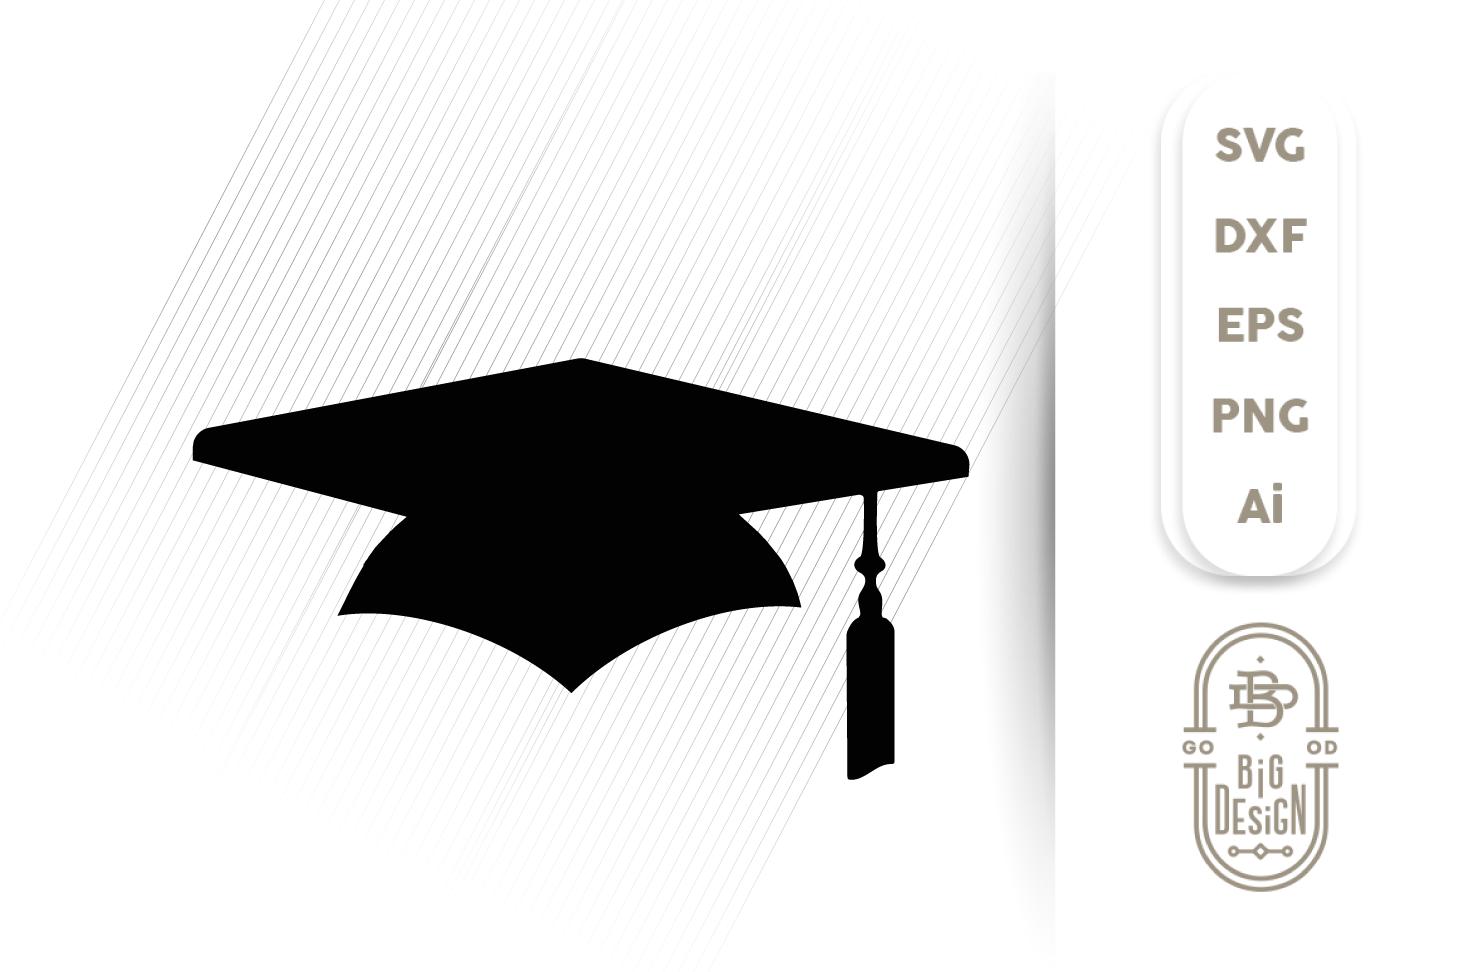 Download Free Svg Files For Cricut Graduation